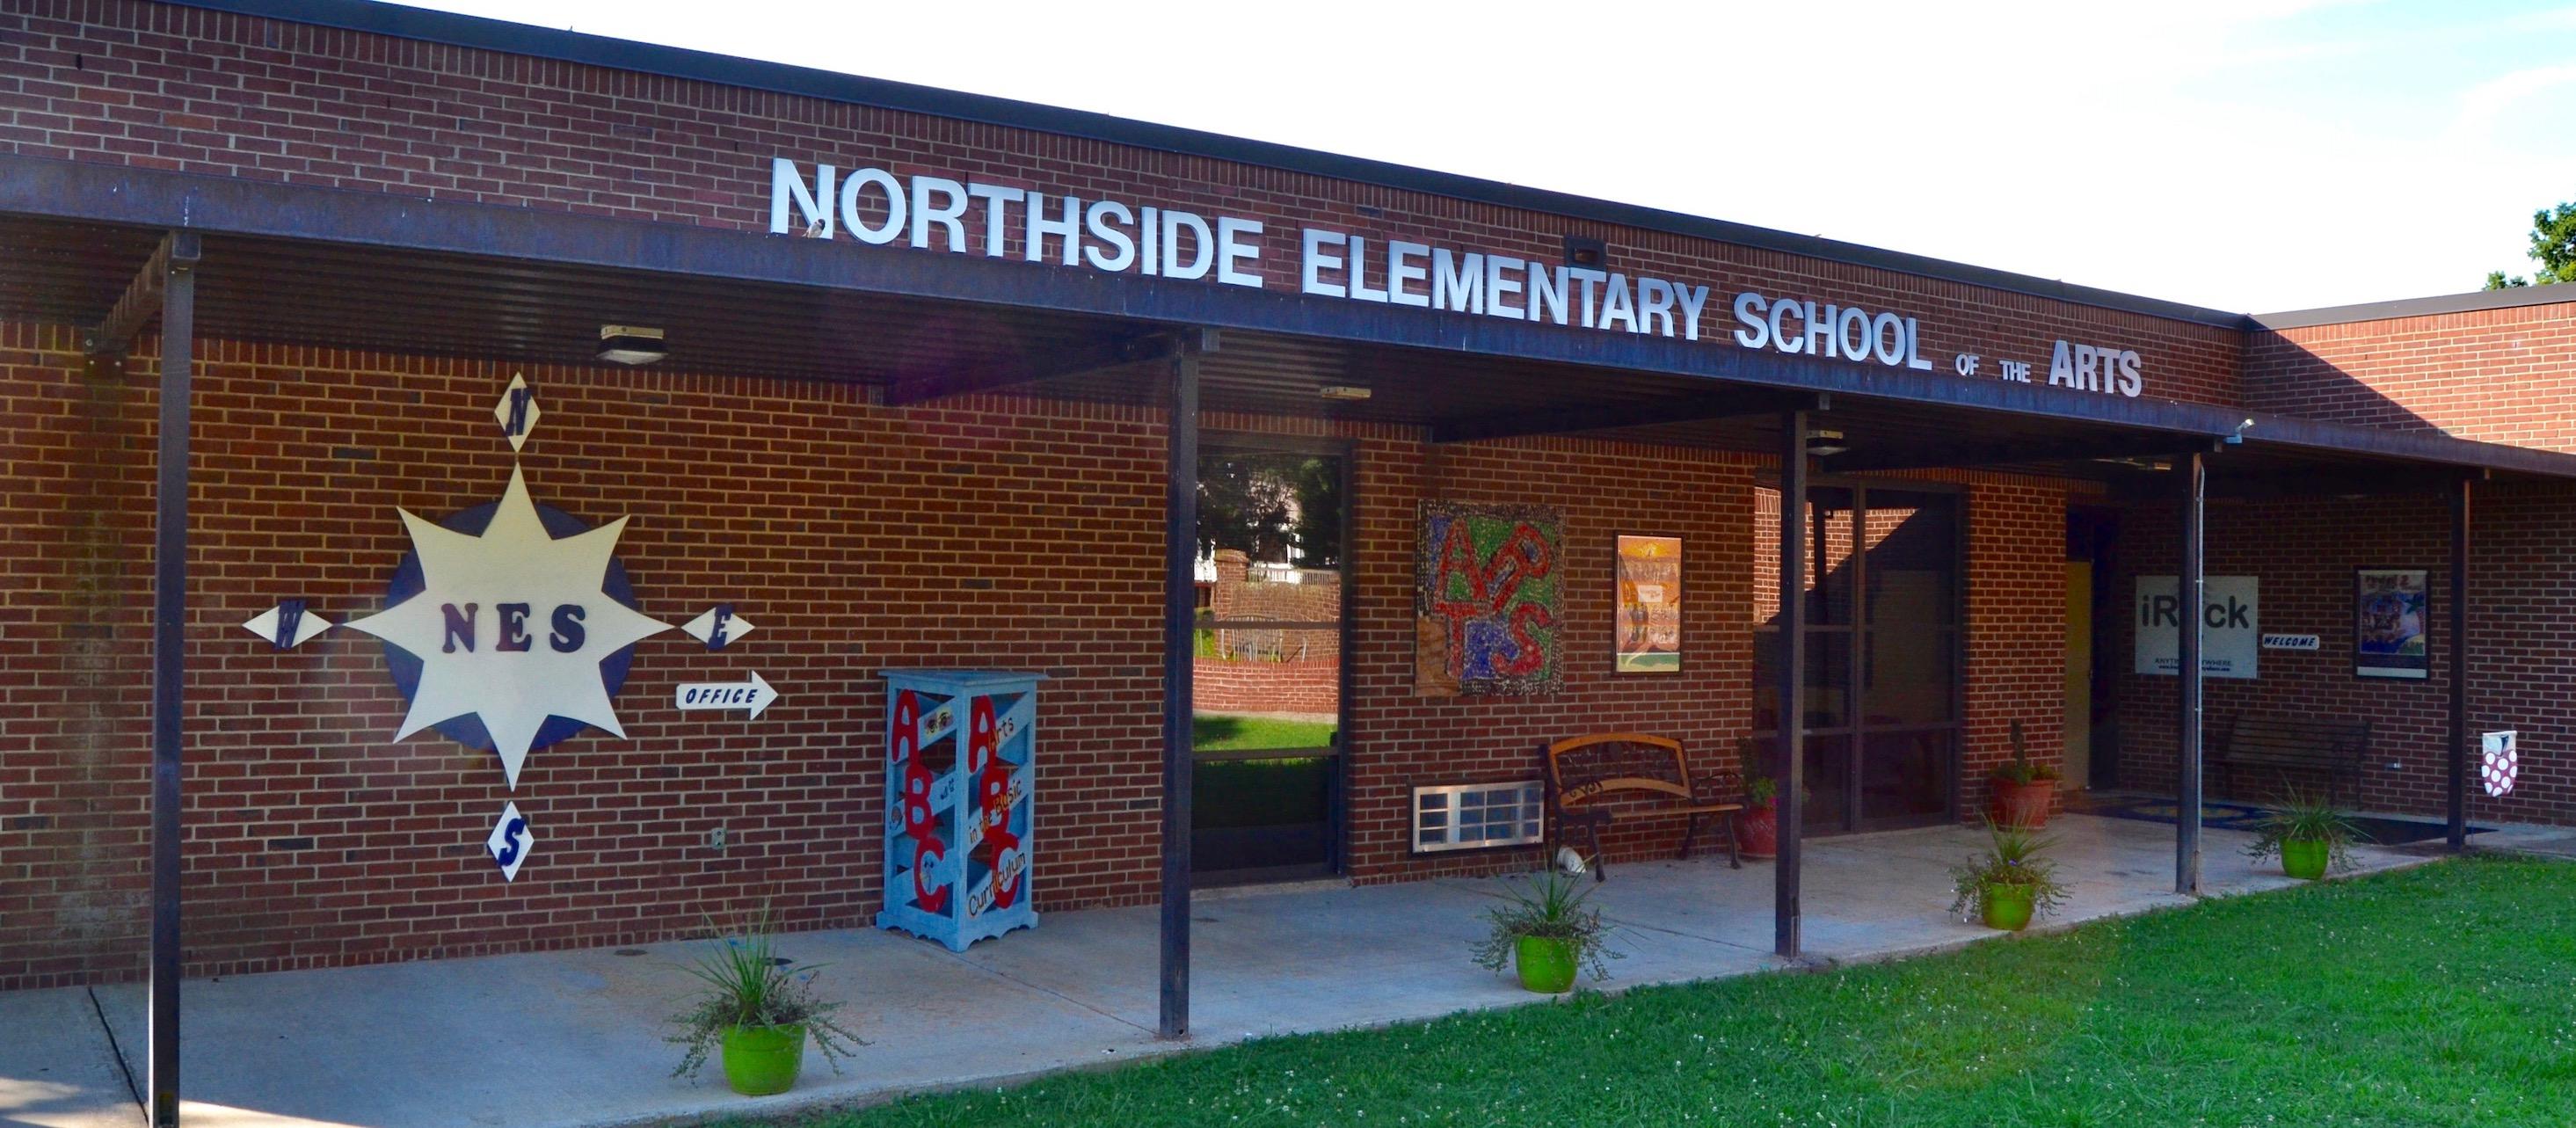 northside elementary school of the arts homepage